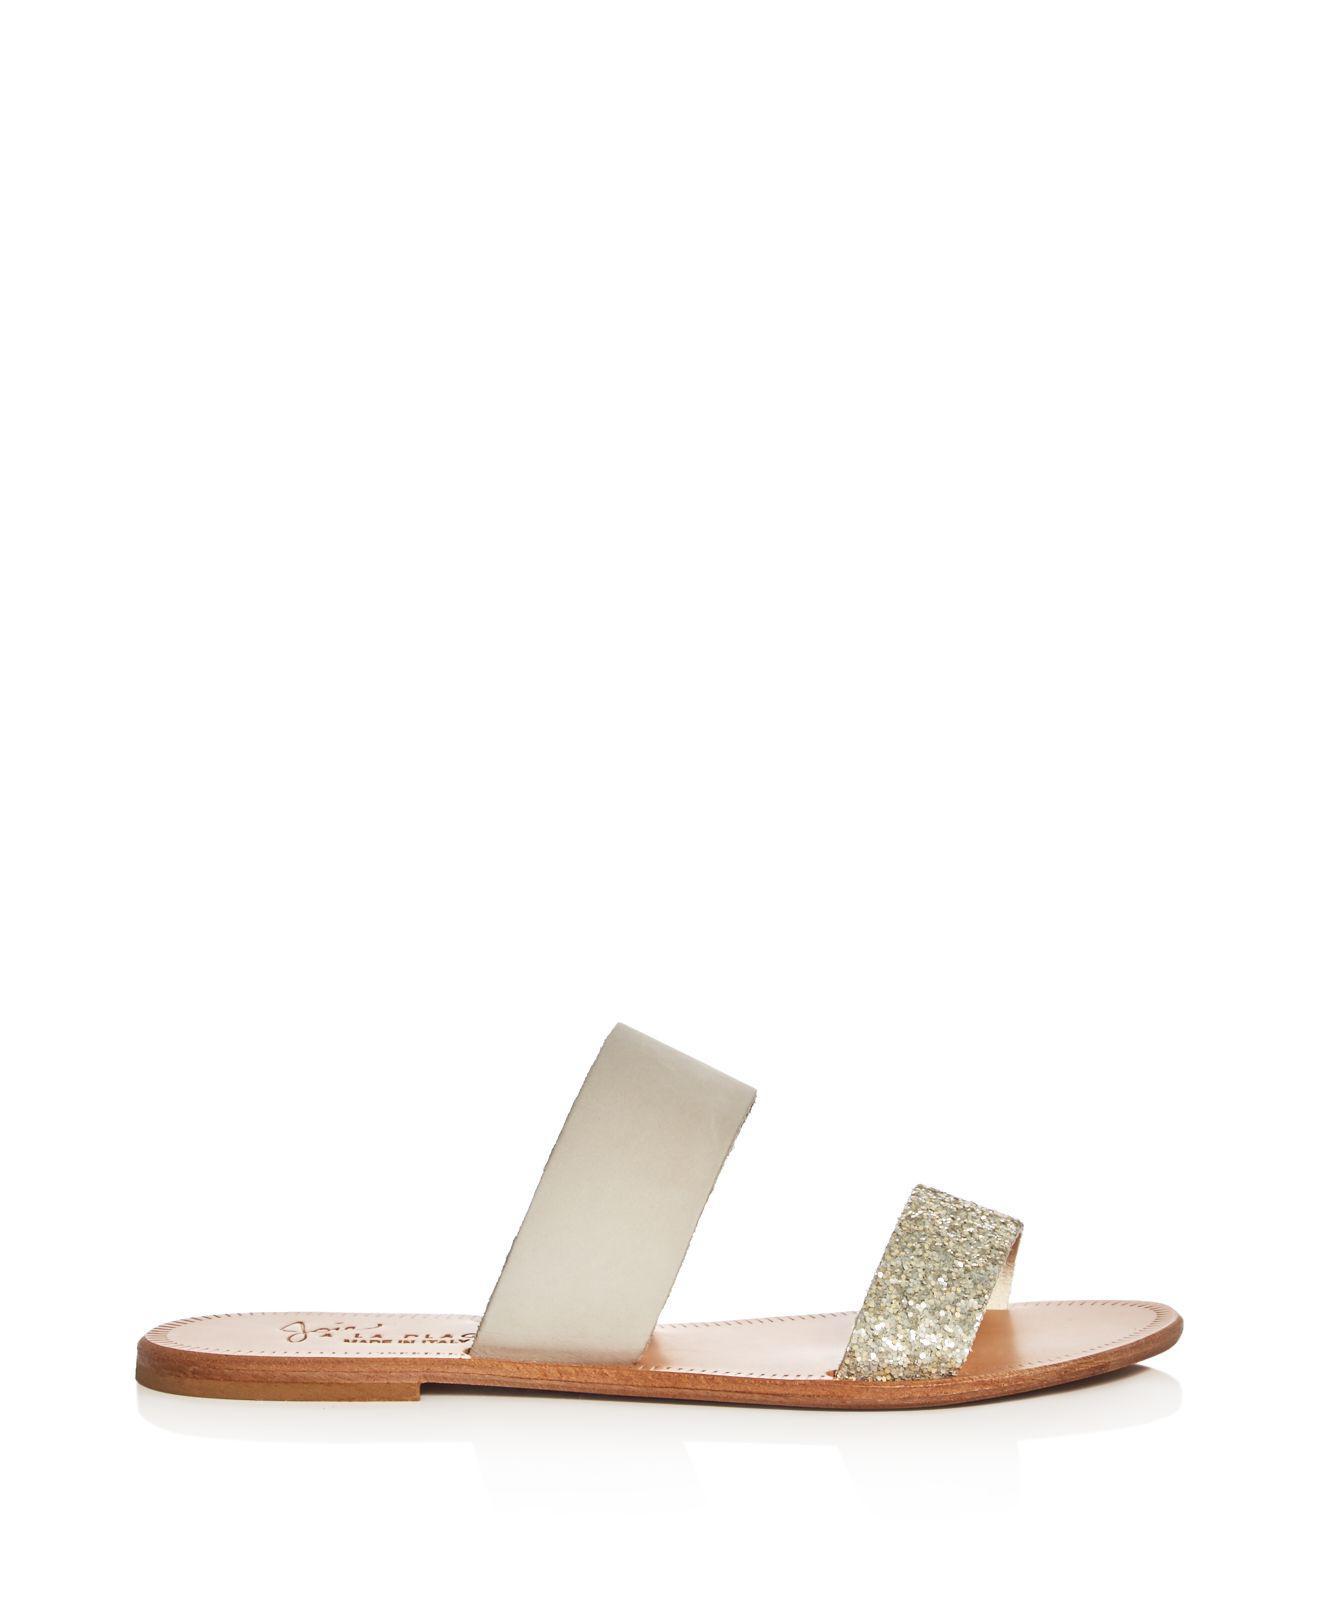 Joie Glitter Slide Sandals 2014 cheap sale wide range of cheap price footaction sale online OCrt2OTUWj